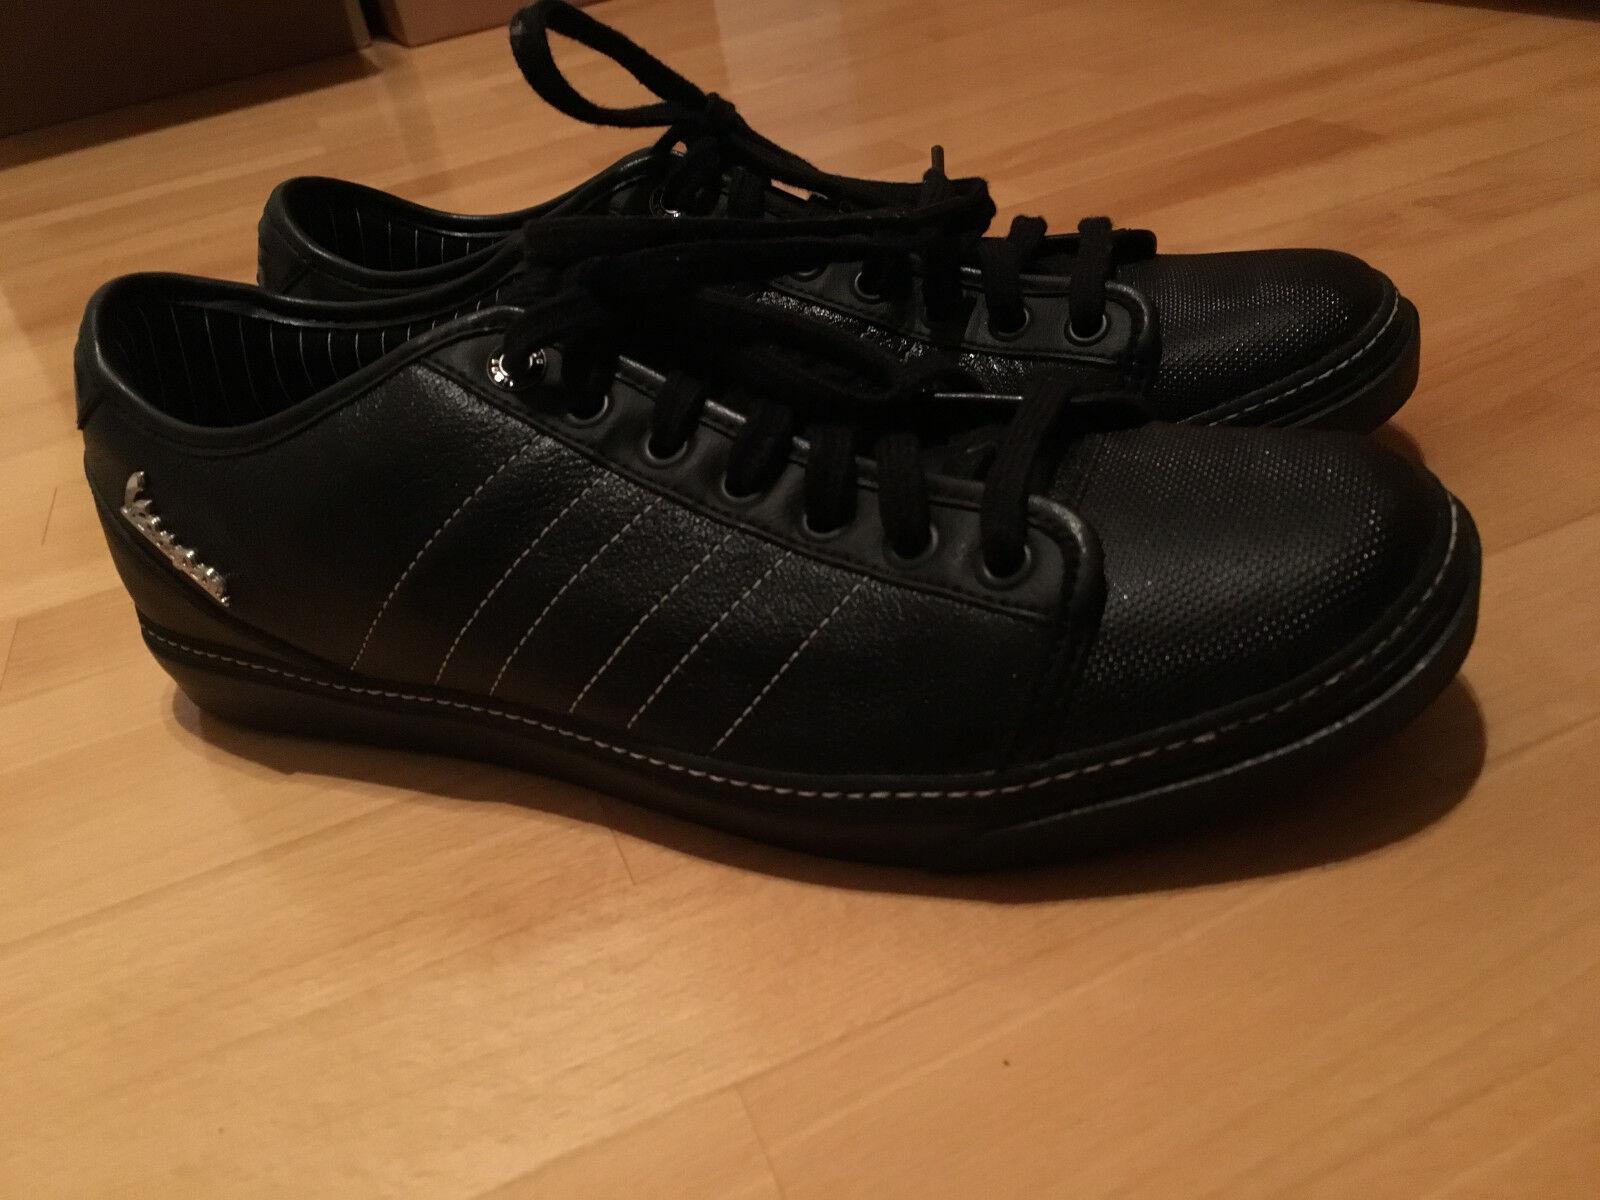 Adidas Vespa Schwarz Neu selten Gr.42,2 3 b787ddoew25638